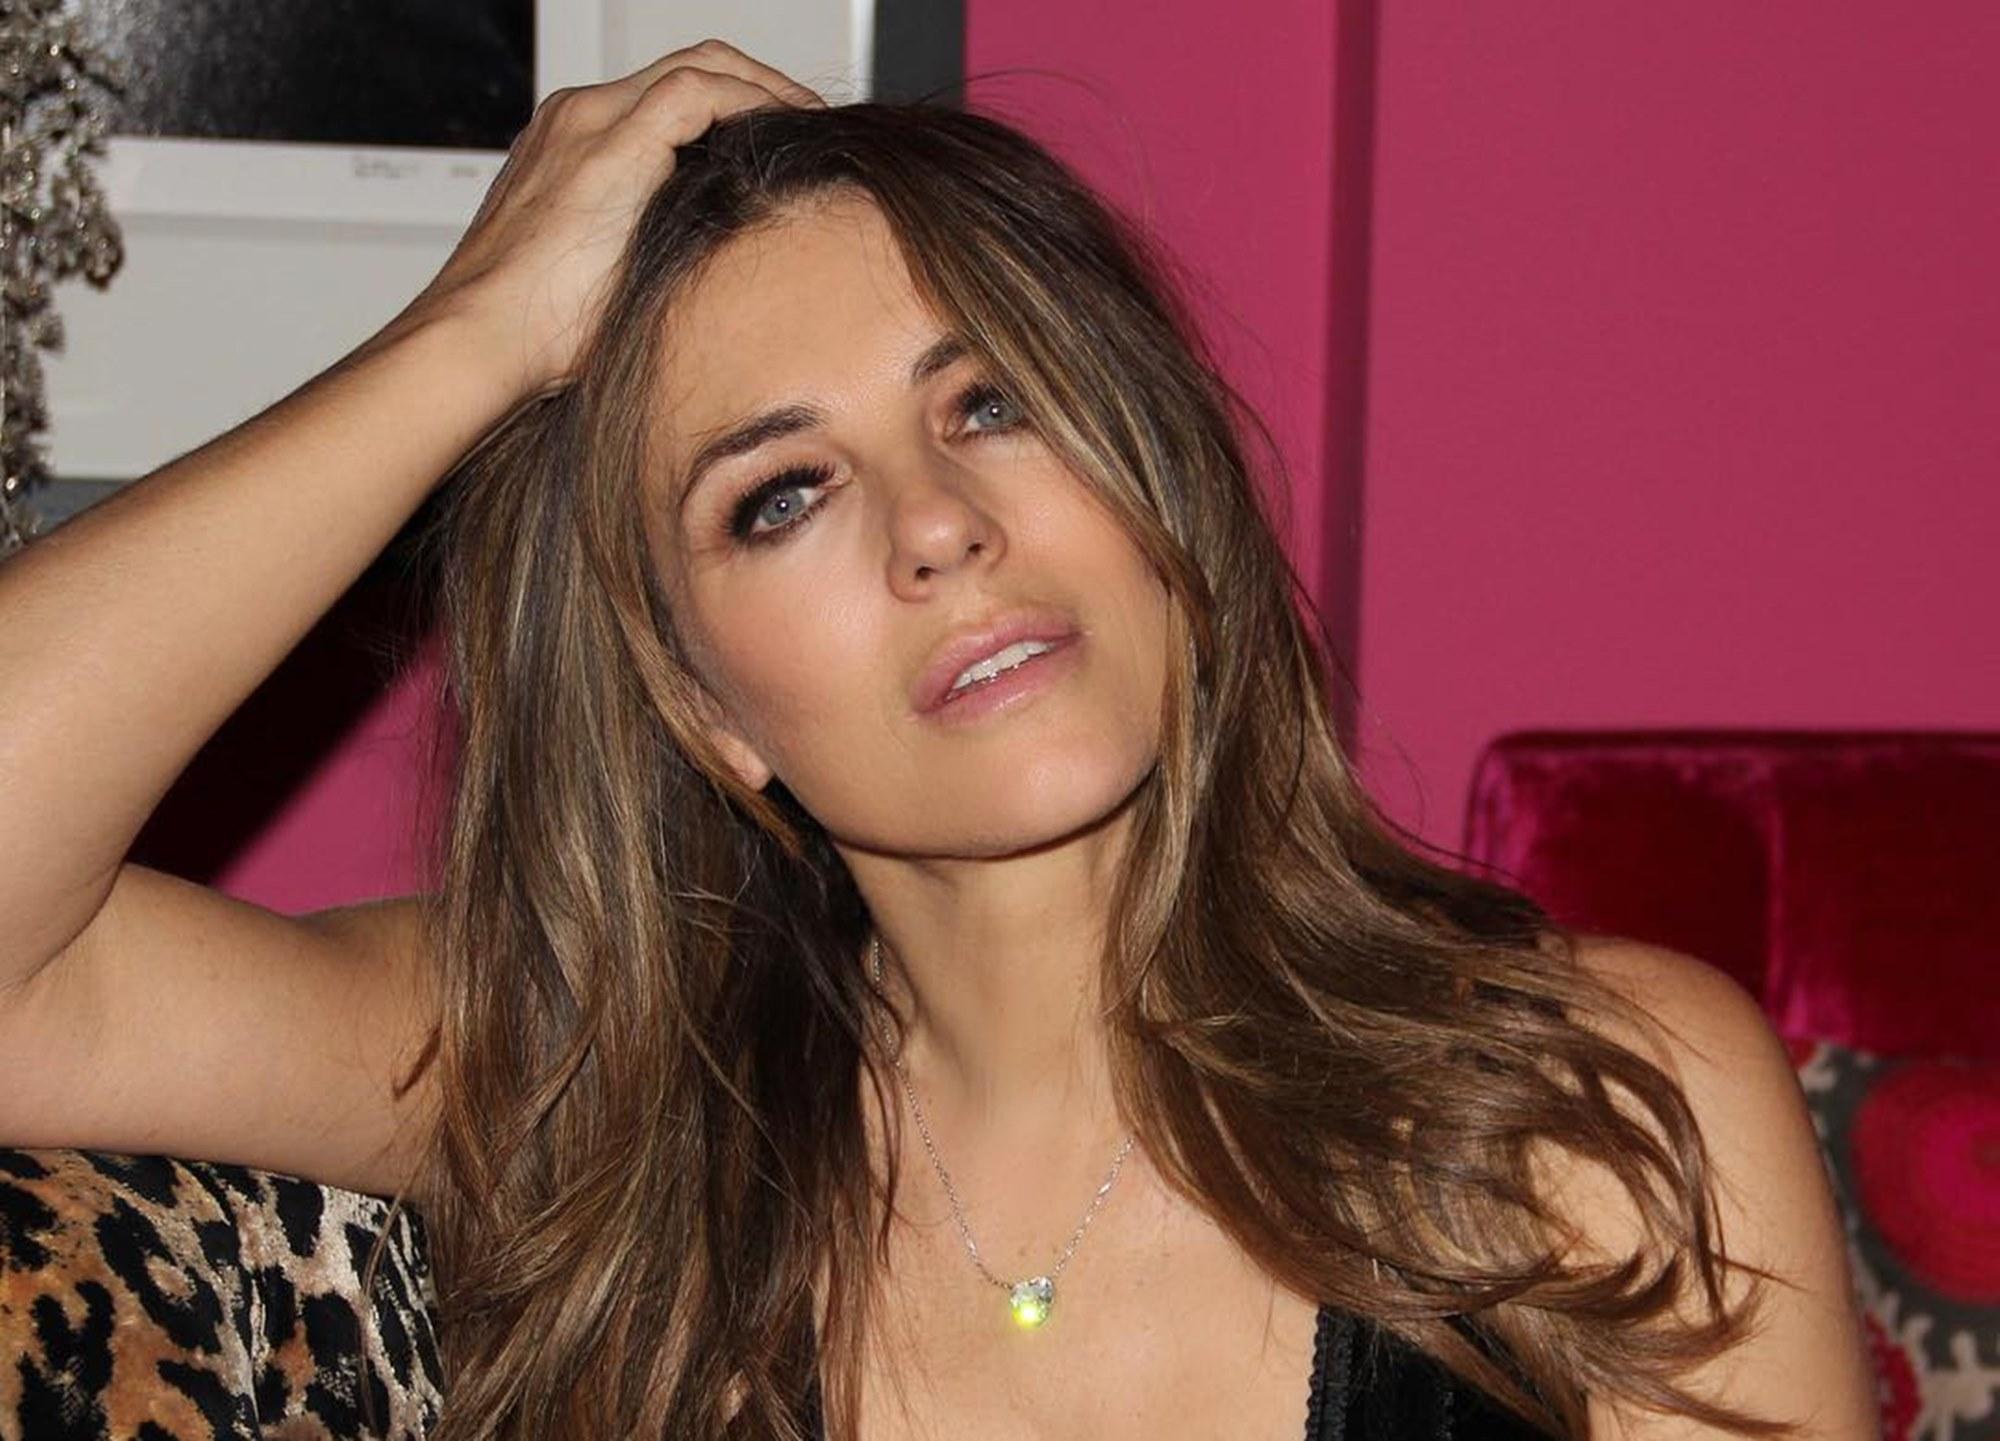 Elzabeth Hurley Coronavirus Actress Model